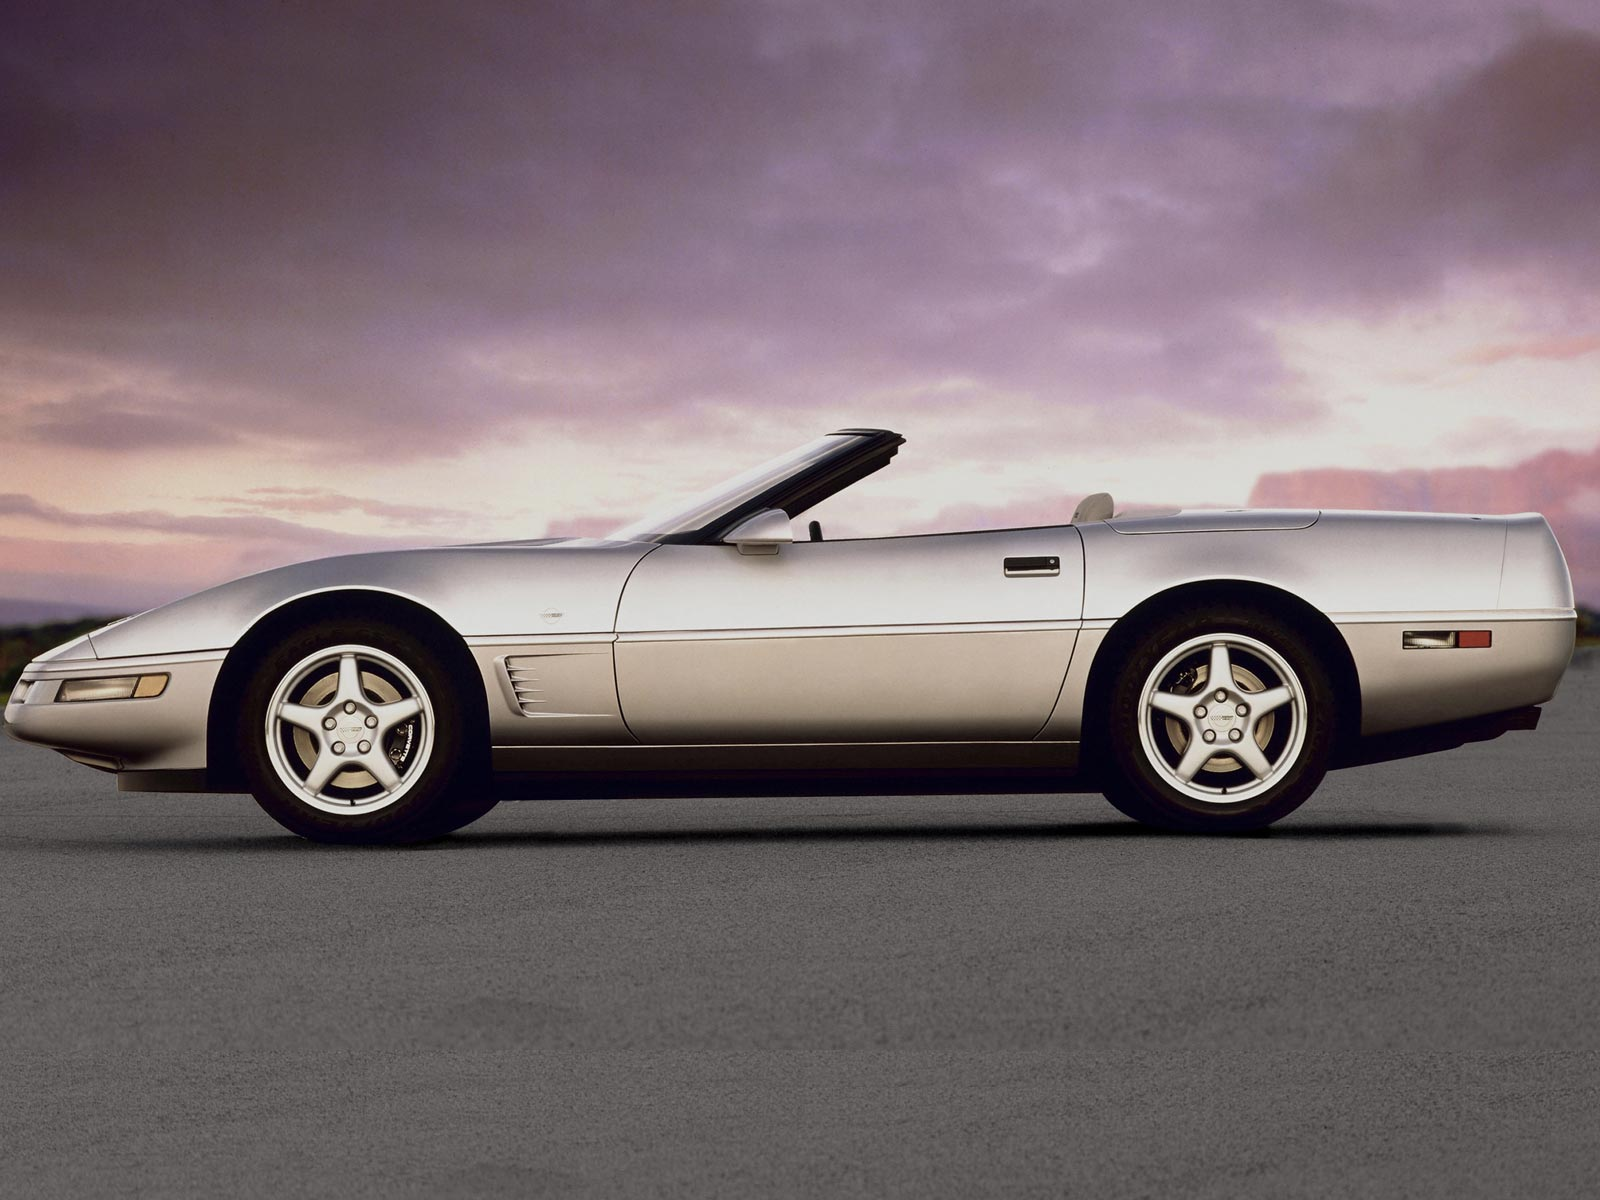 1996 Chevrolet Corvette Cabrio (c) Chevrolet